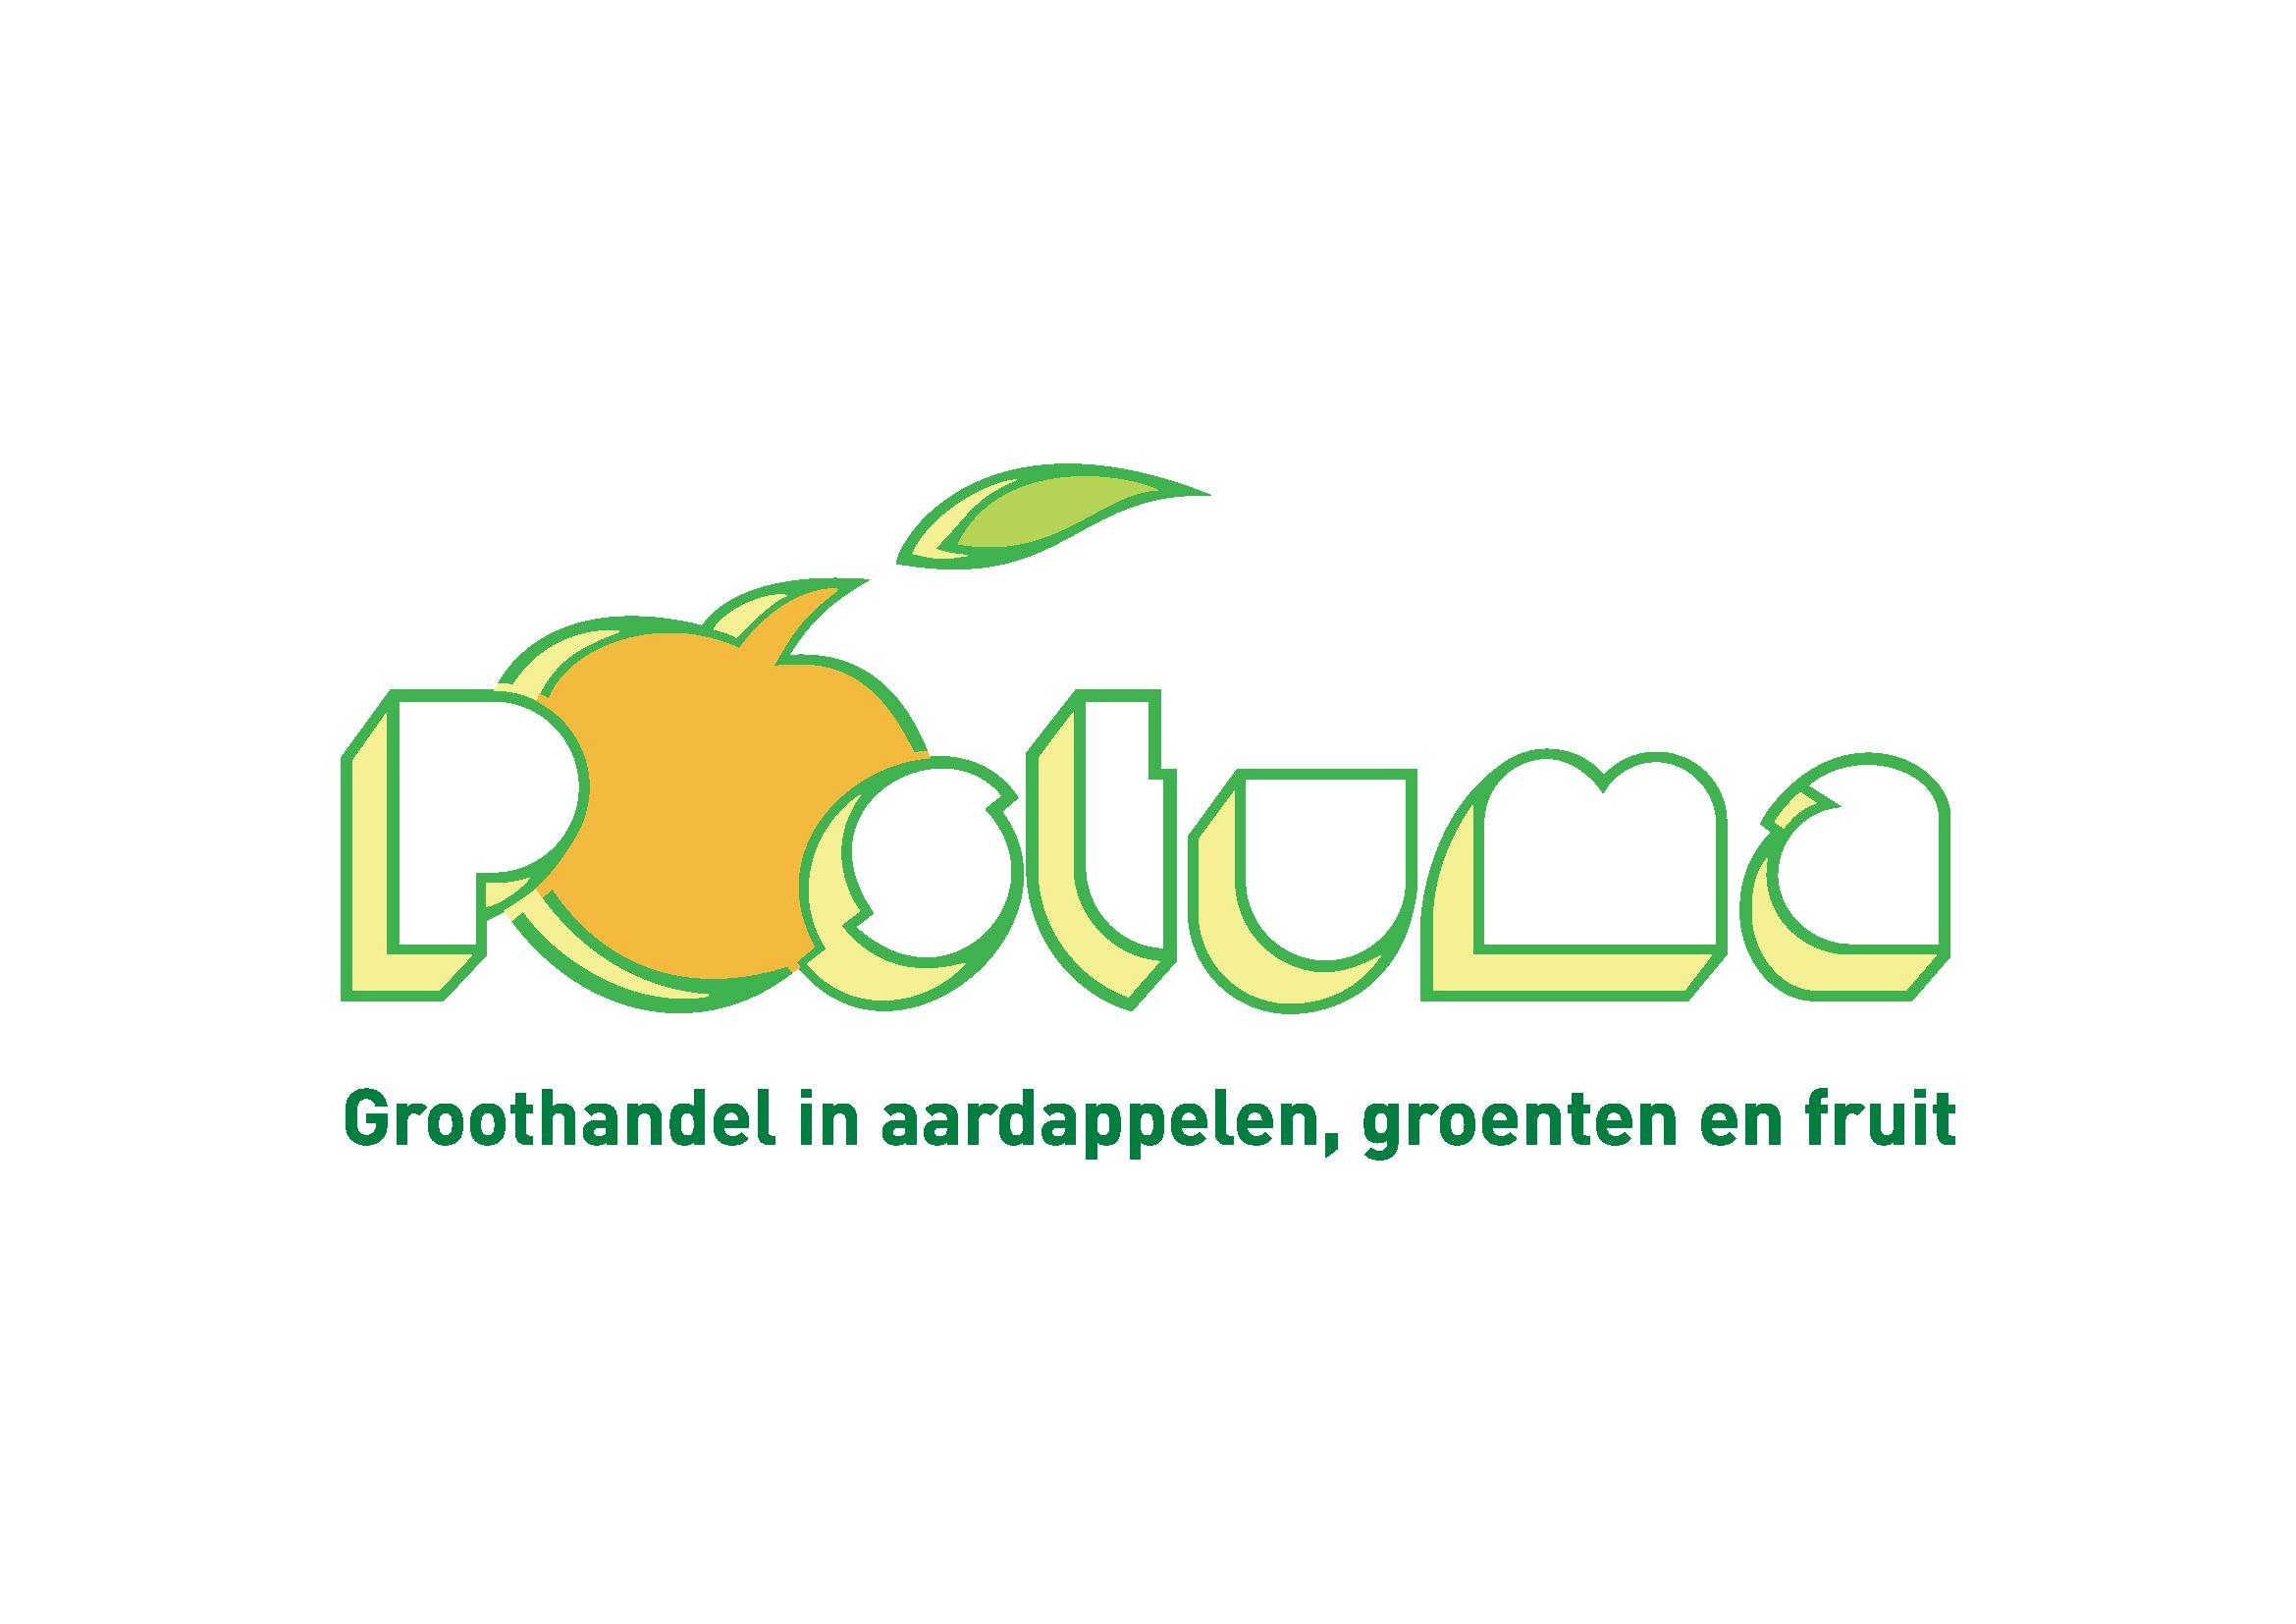 04 Postuma - logo